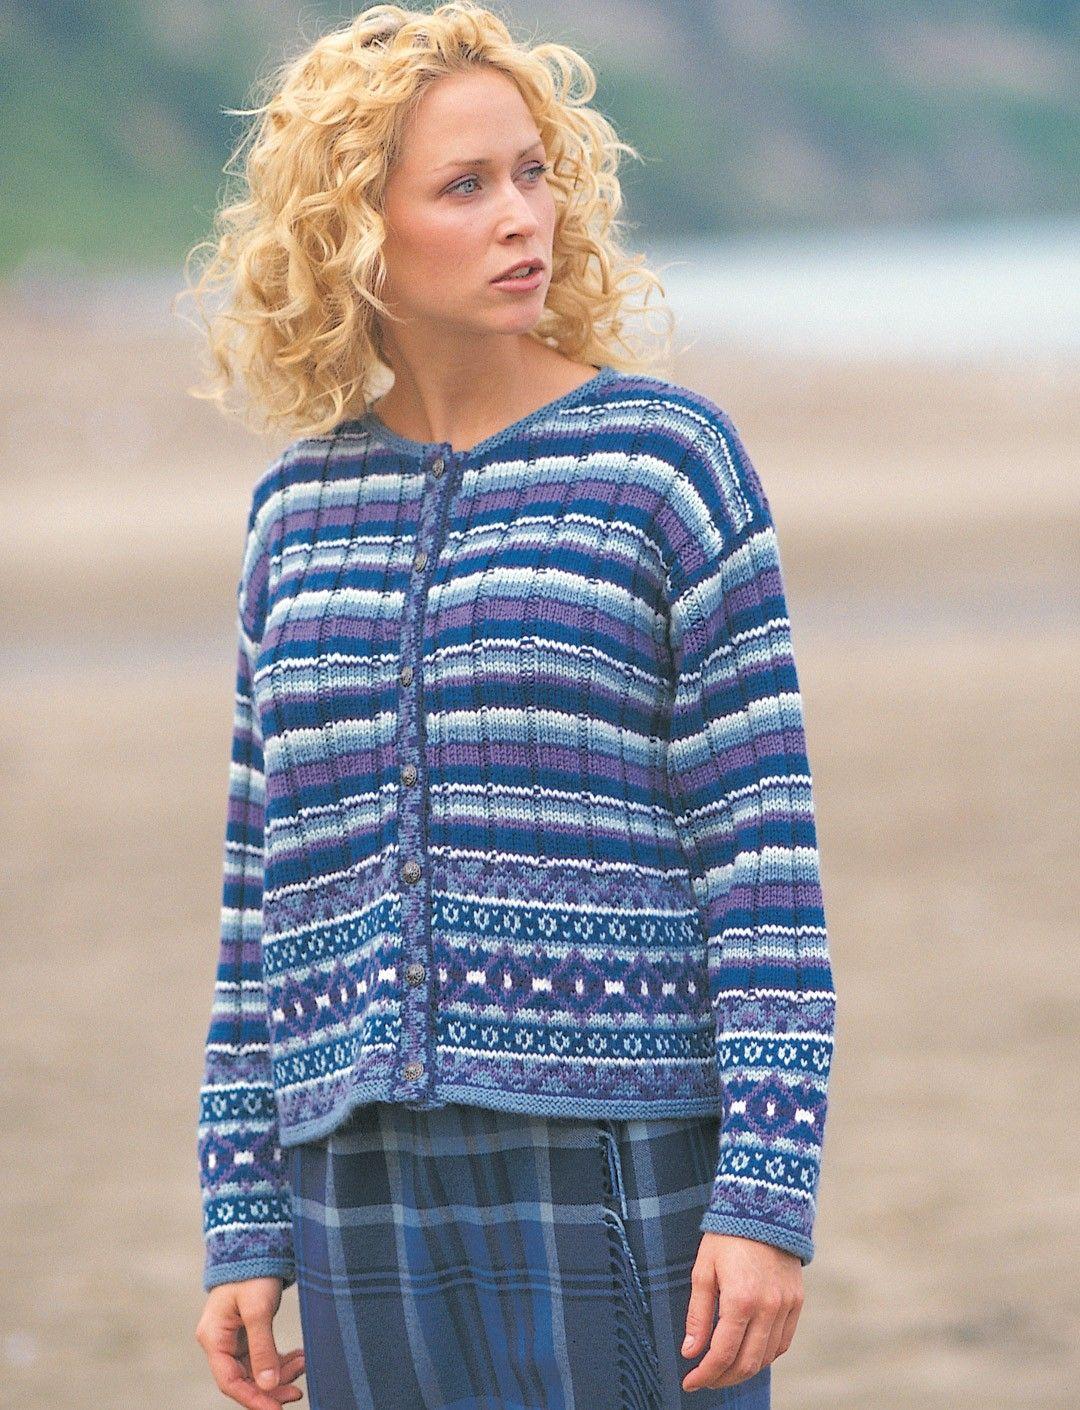 Yarnspirations.com - Patons Fair Isle Plaid Cardigan - Patterns ...